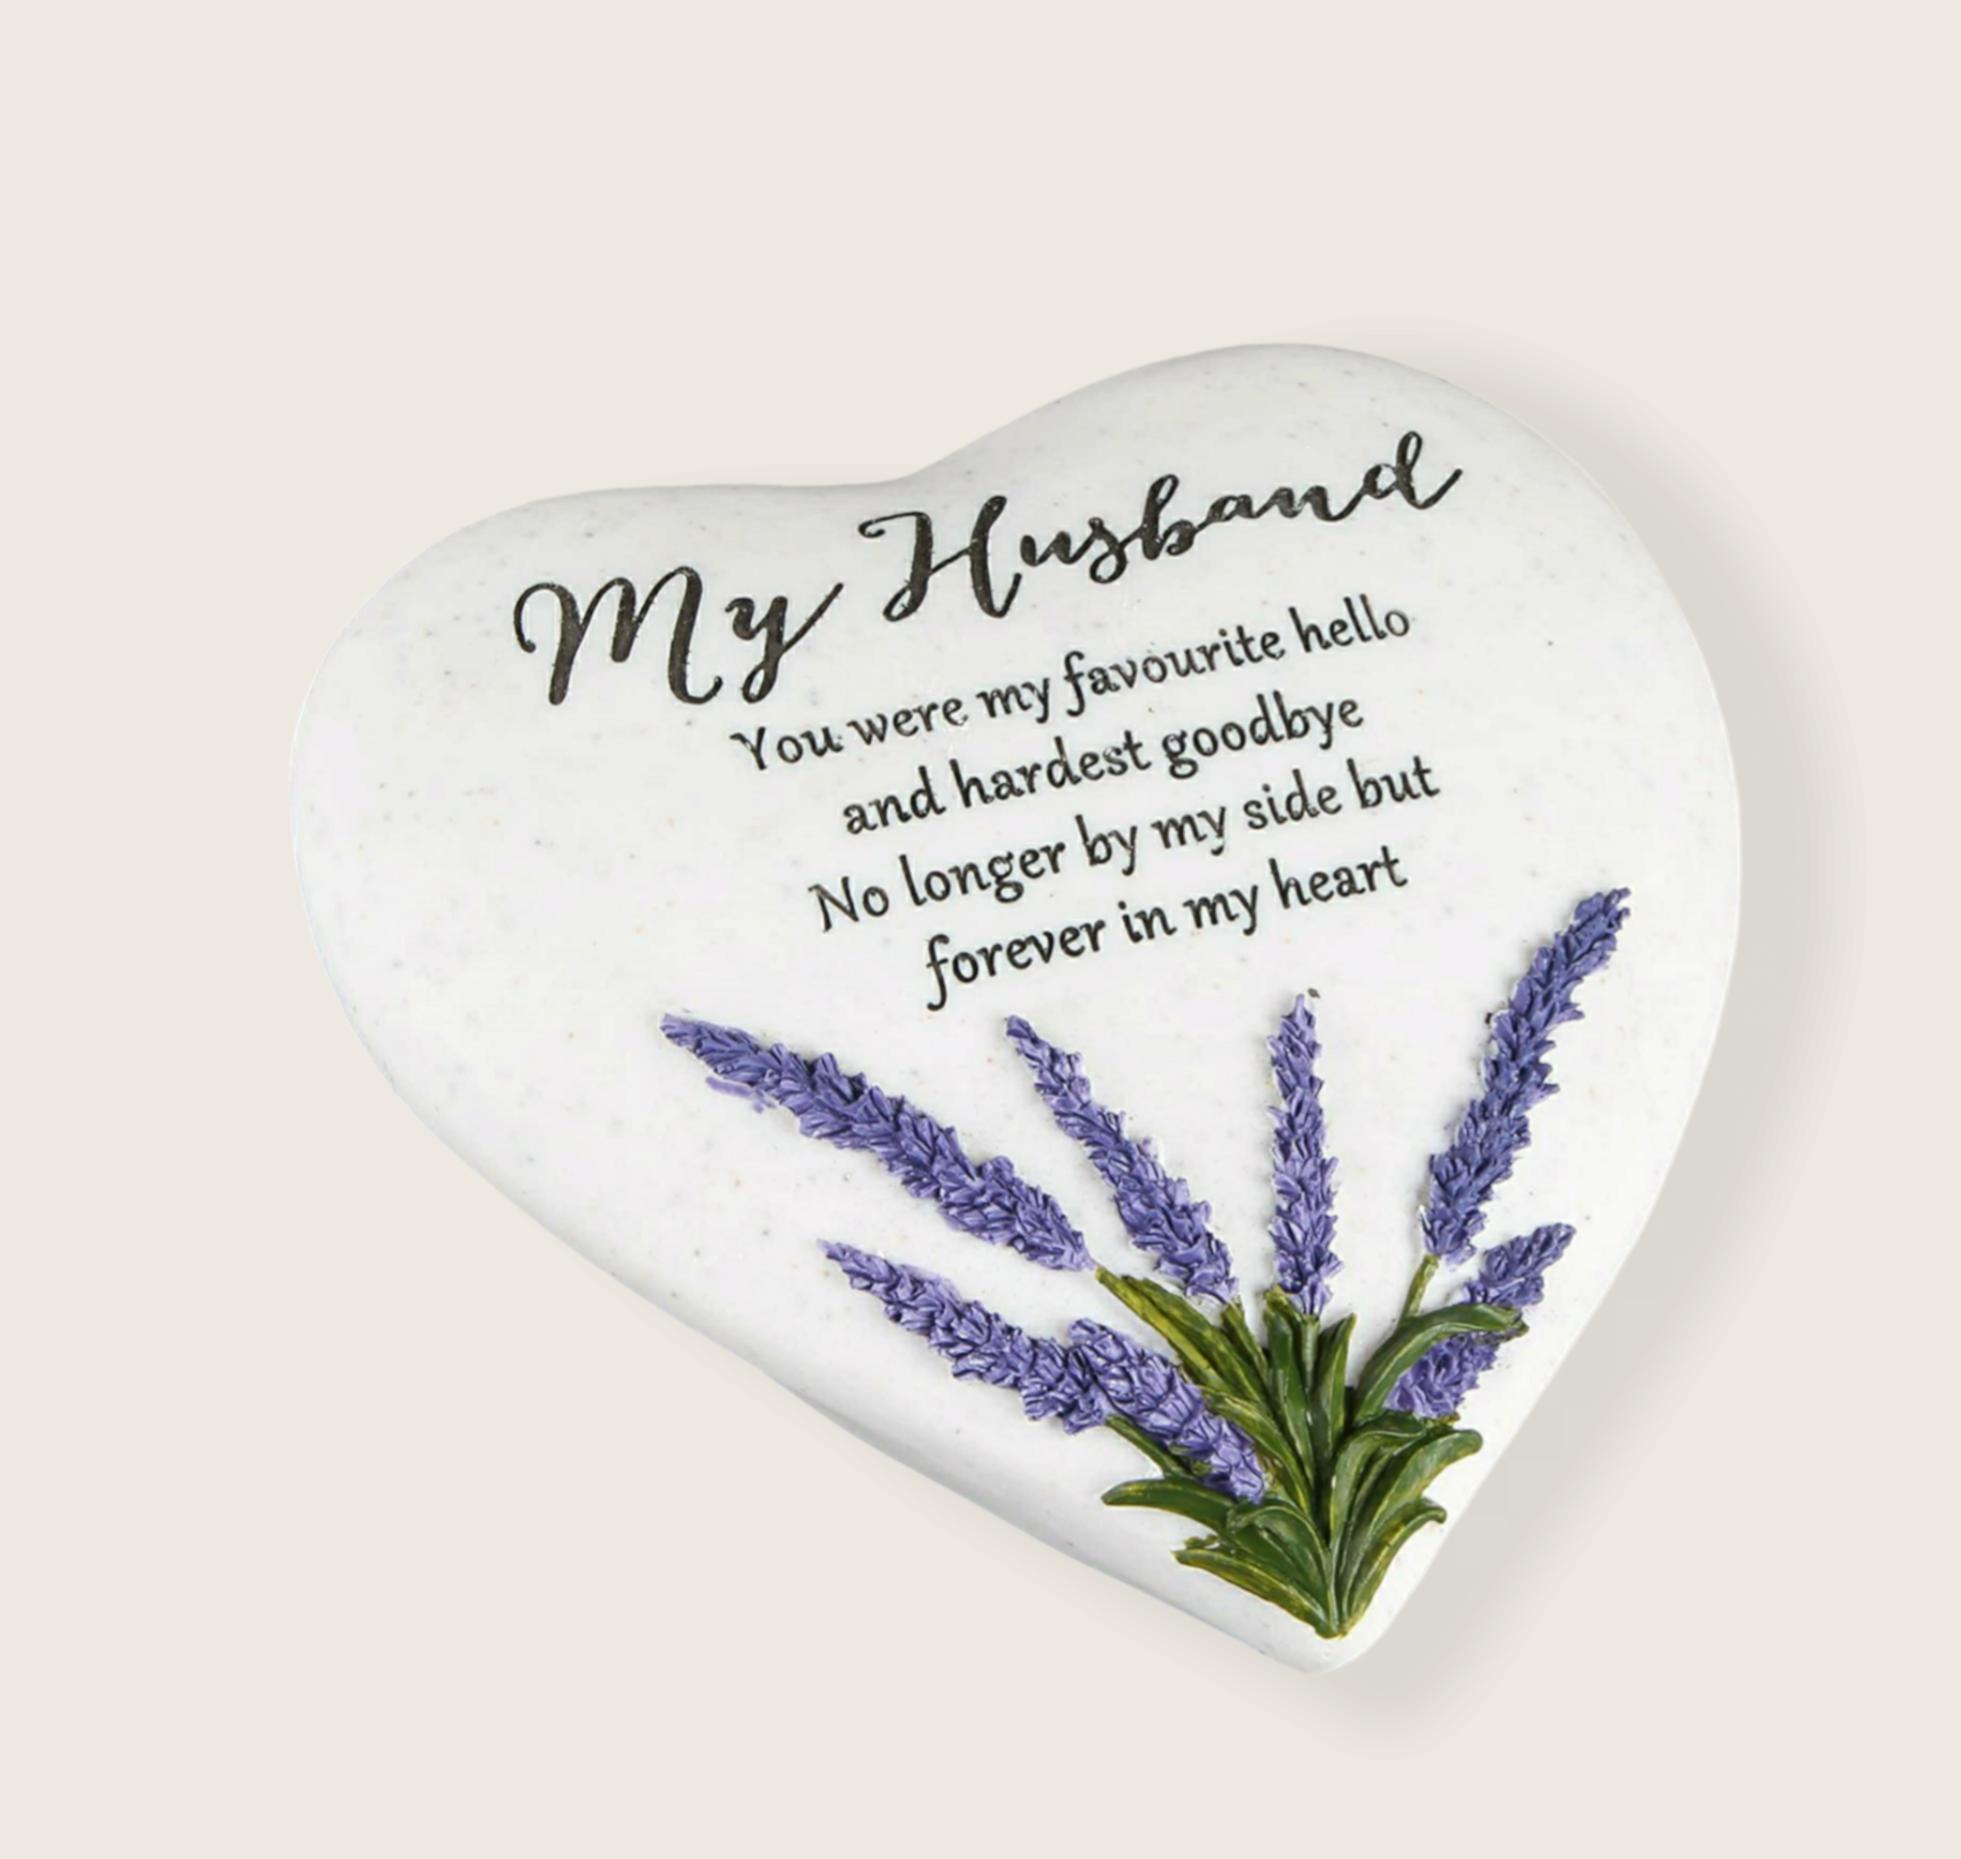 Husband – Heart Shape Outdoor Memorial Plaque with Lavender design